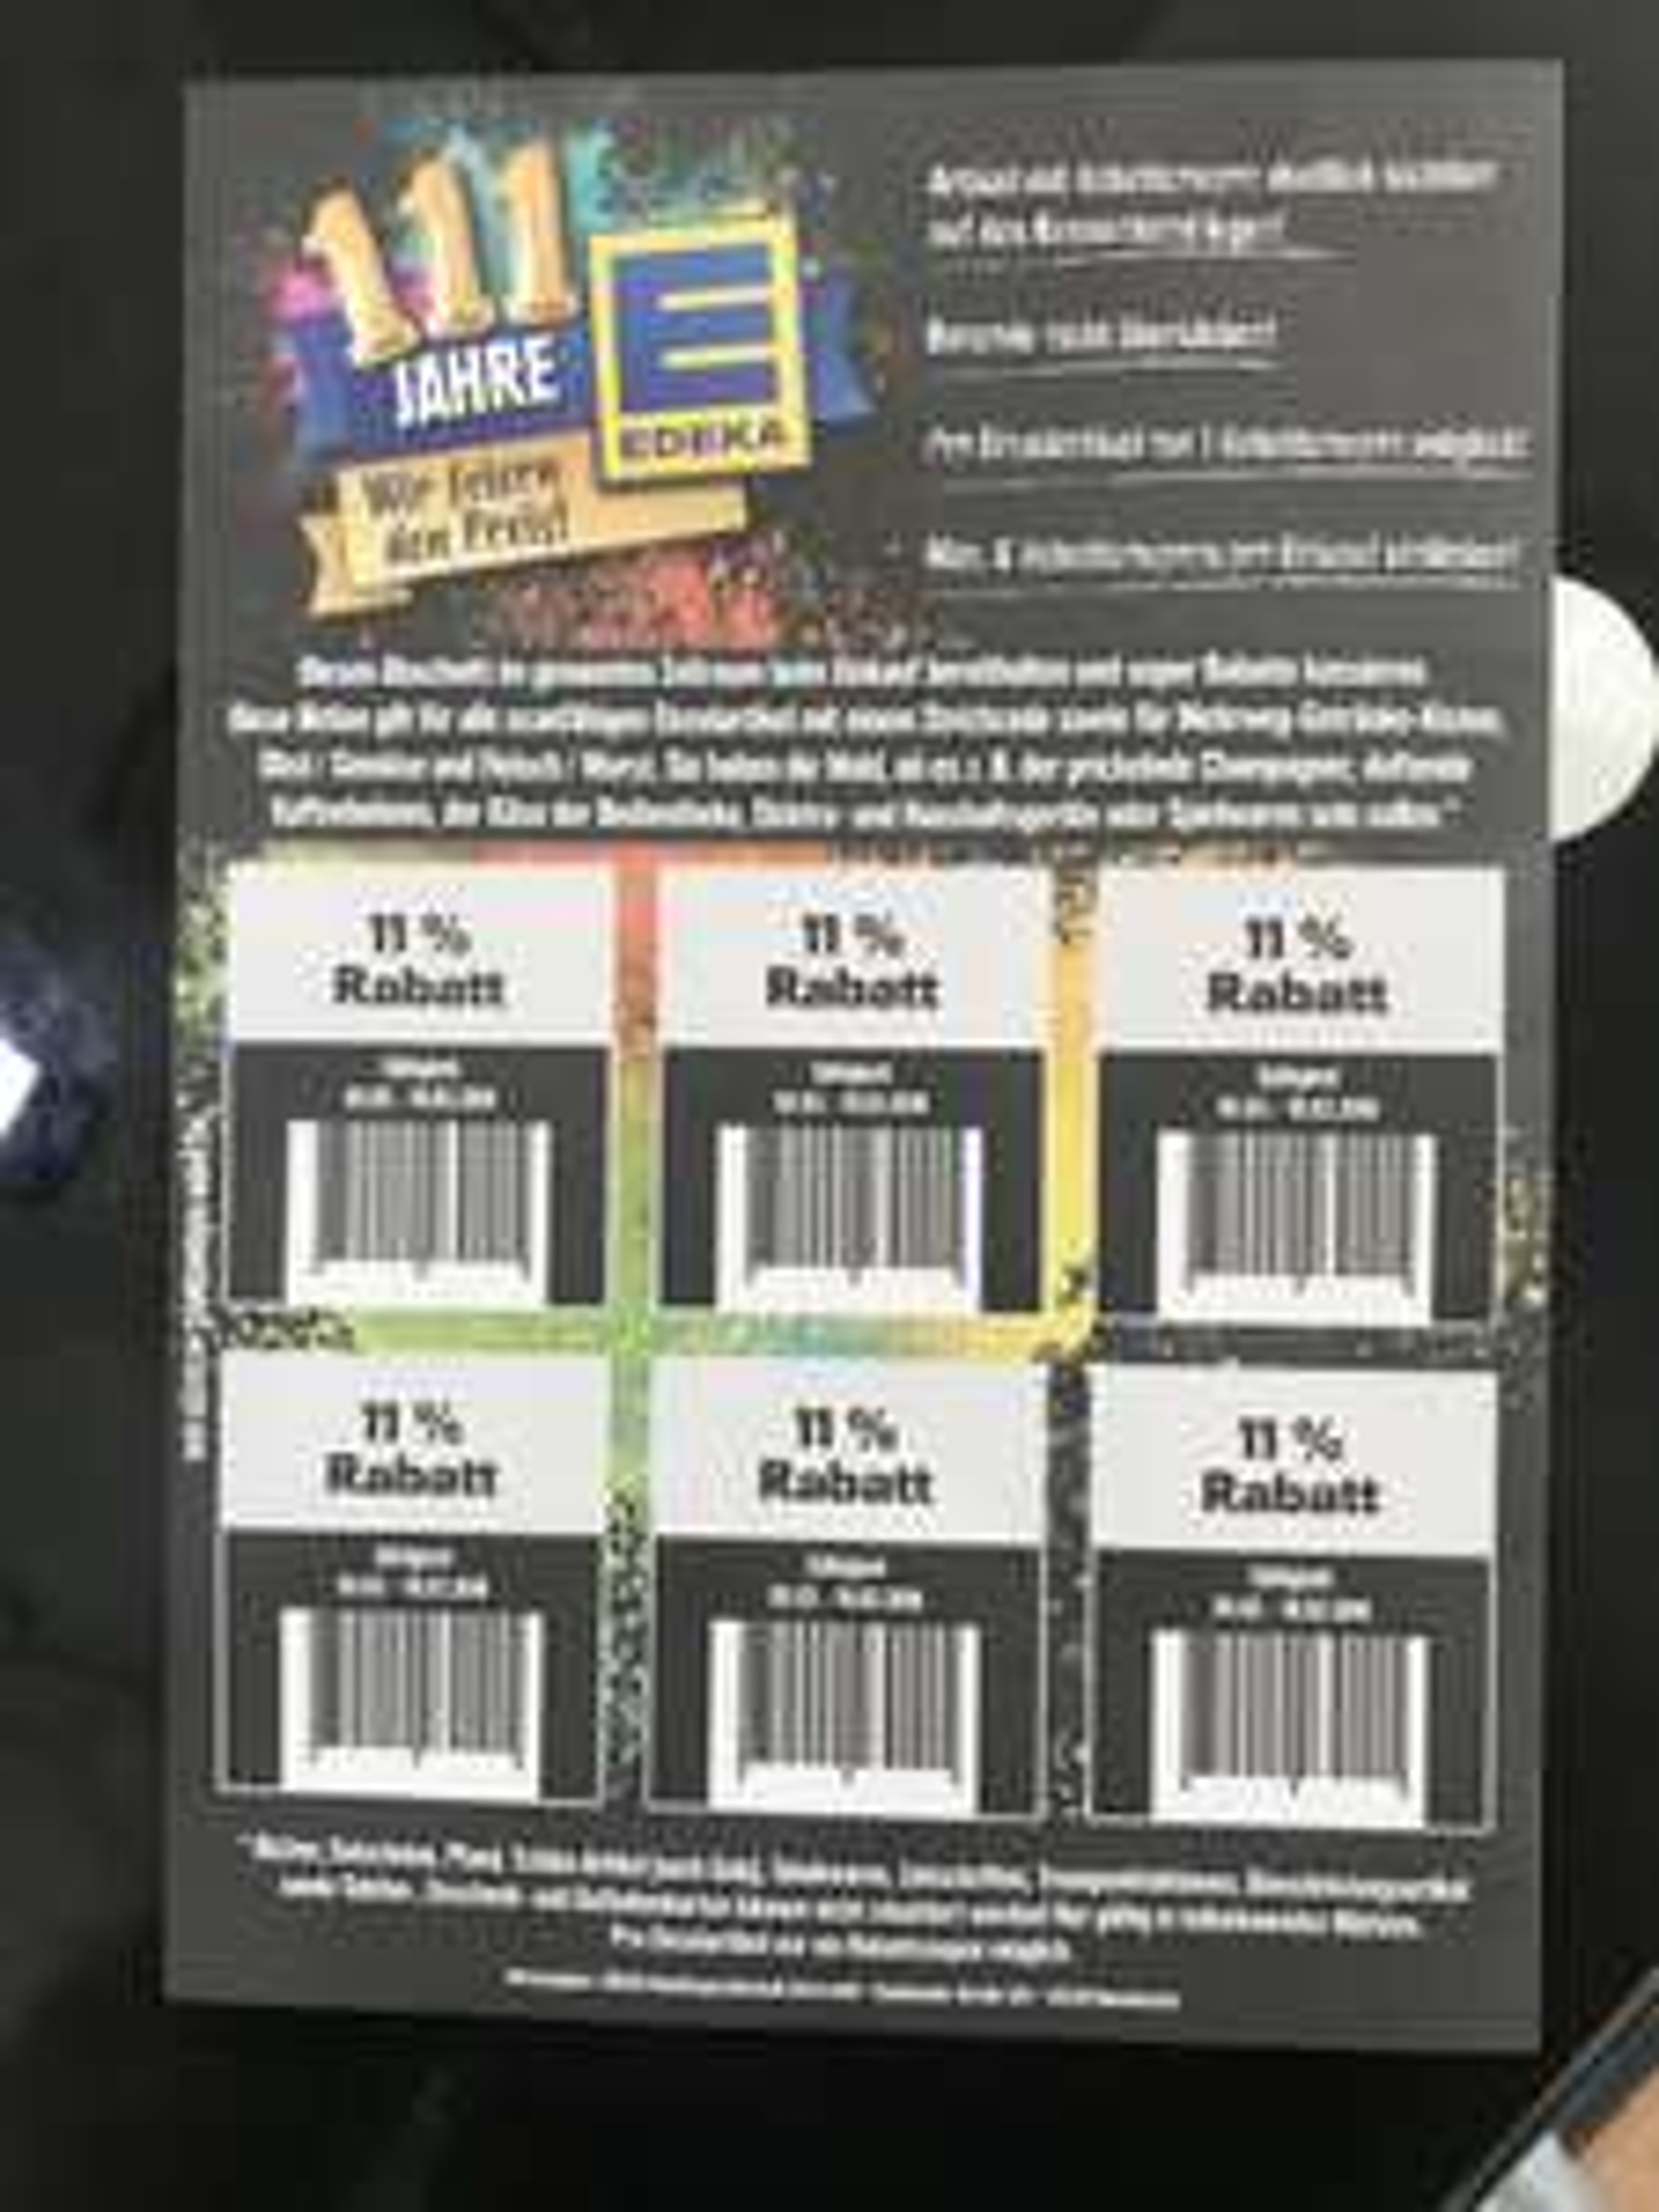 ( Edeka lokal ) 11% Rabatt Aufkleber 6x in der Wochenbeilage ab 05.03.18 gültig